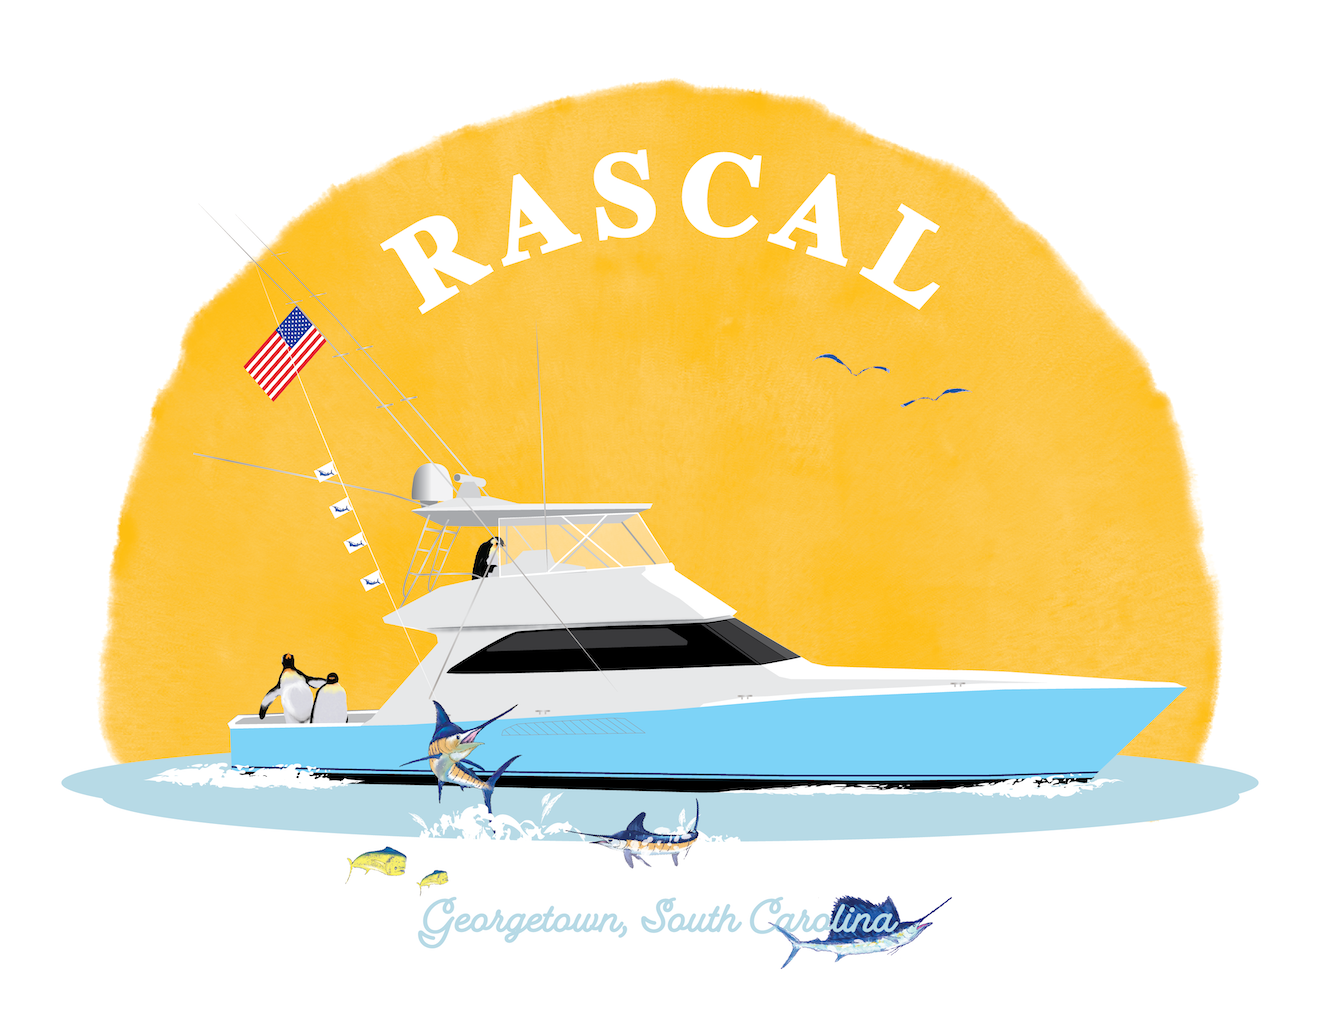 RASCAL v3 A.png